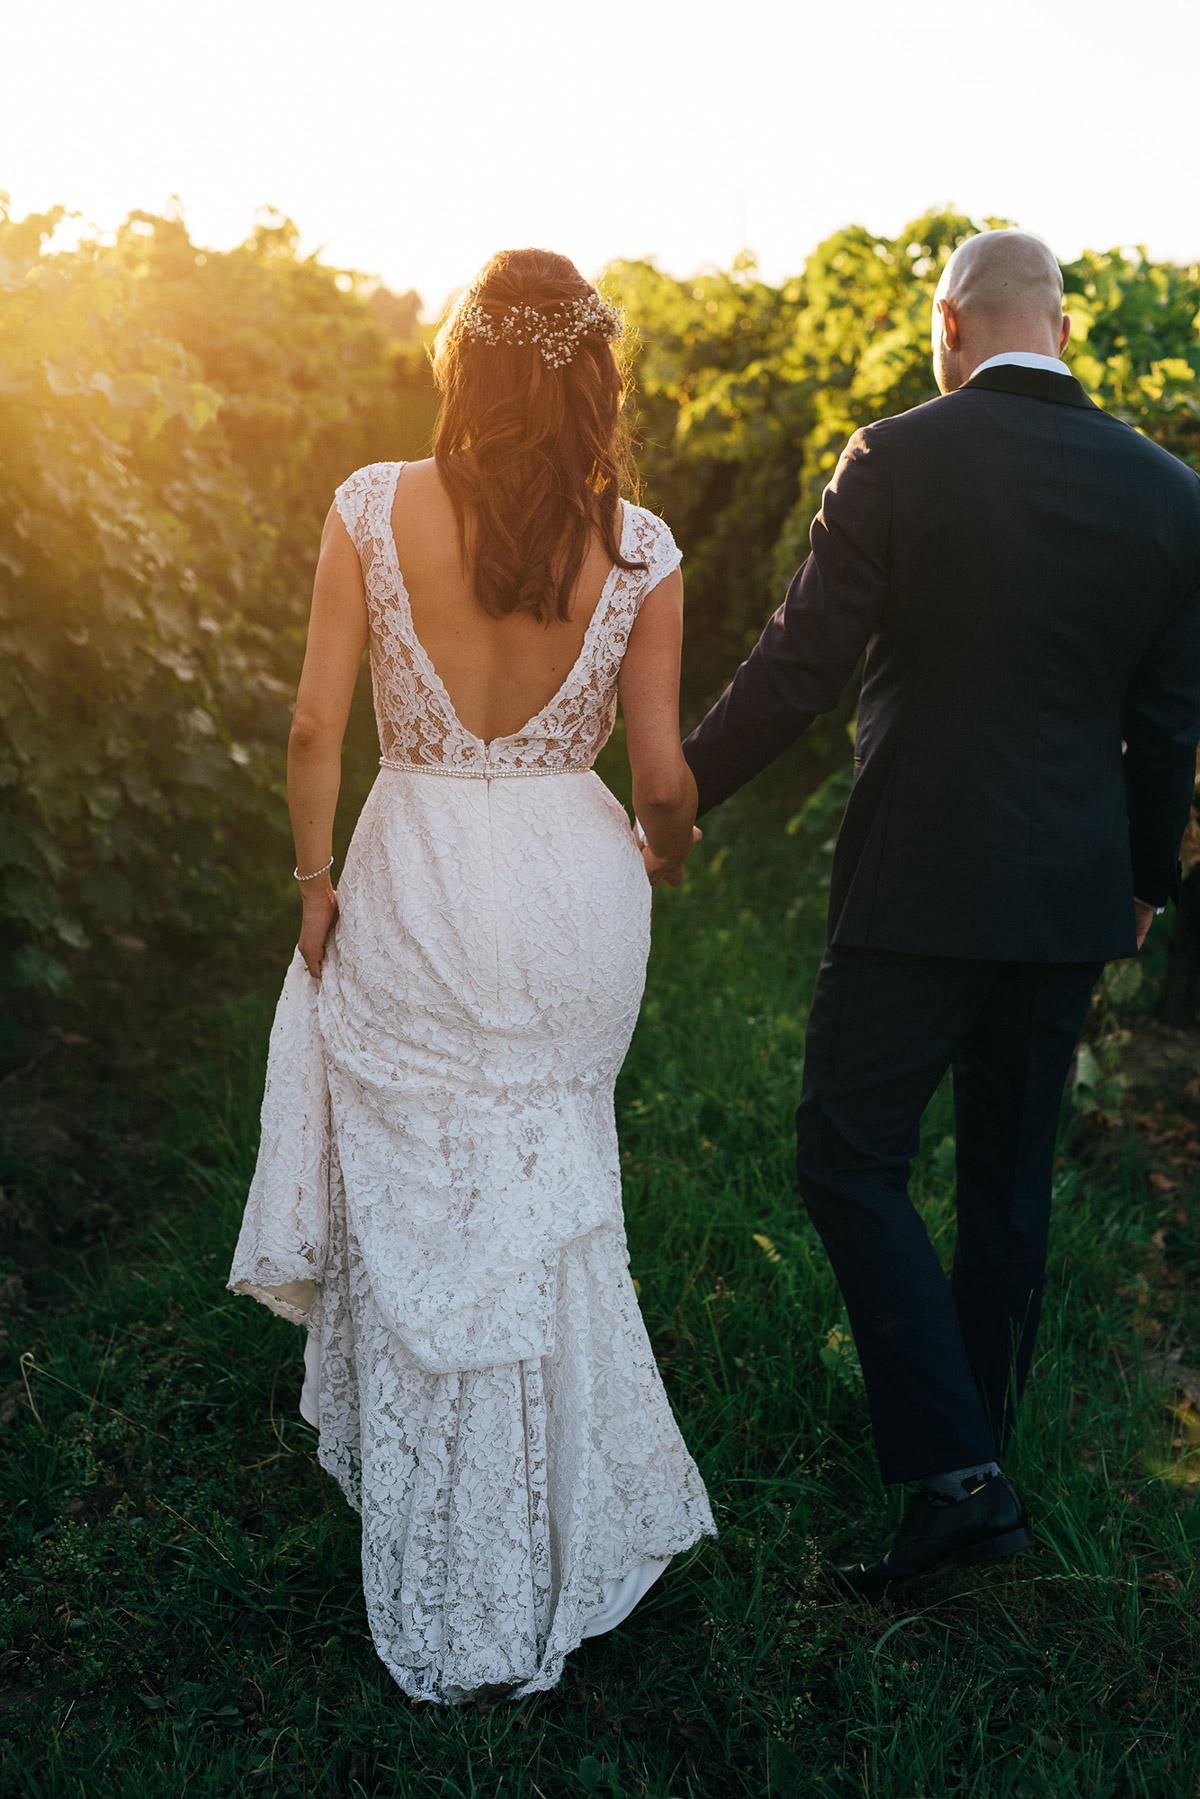 shaw-events-vineyard-bride-swish-list-kurtz-orchards-niagara-on-the-lake-wedding-19.jpg